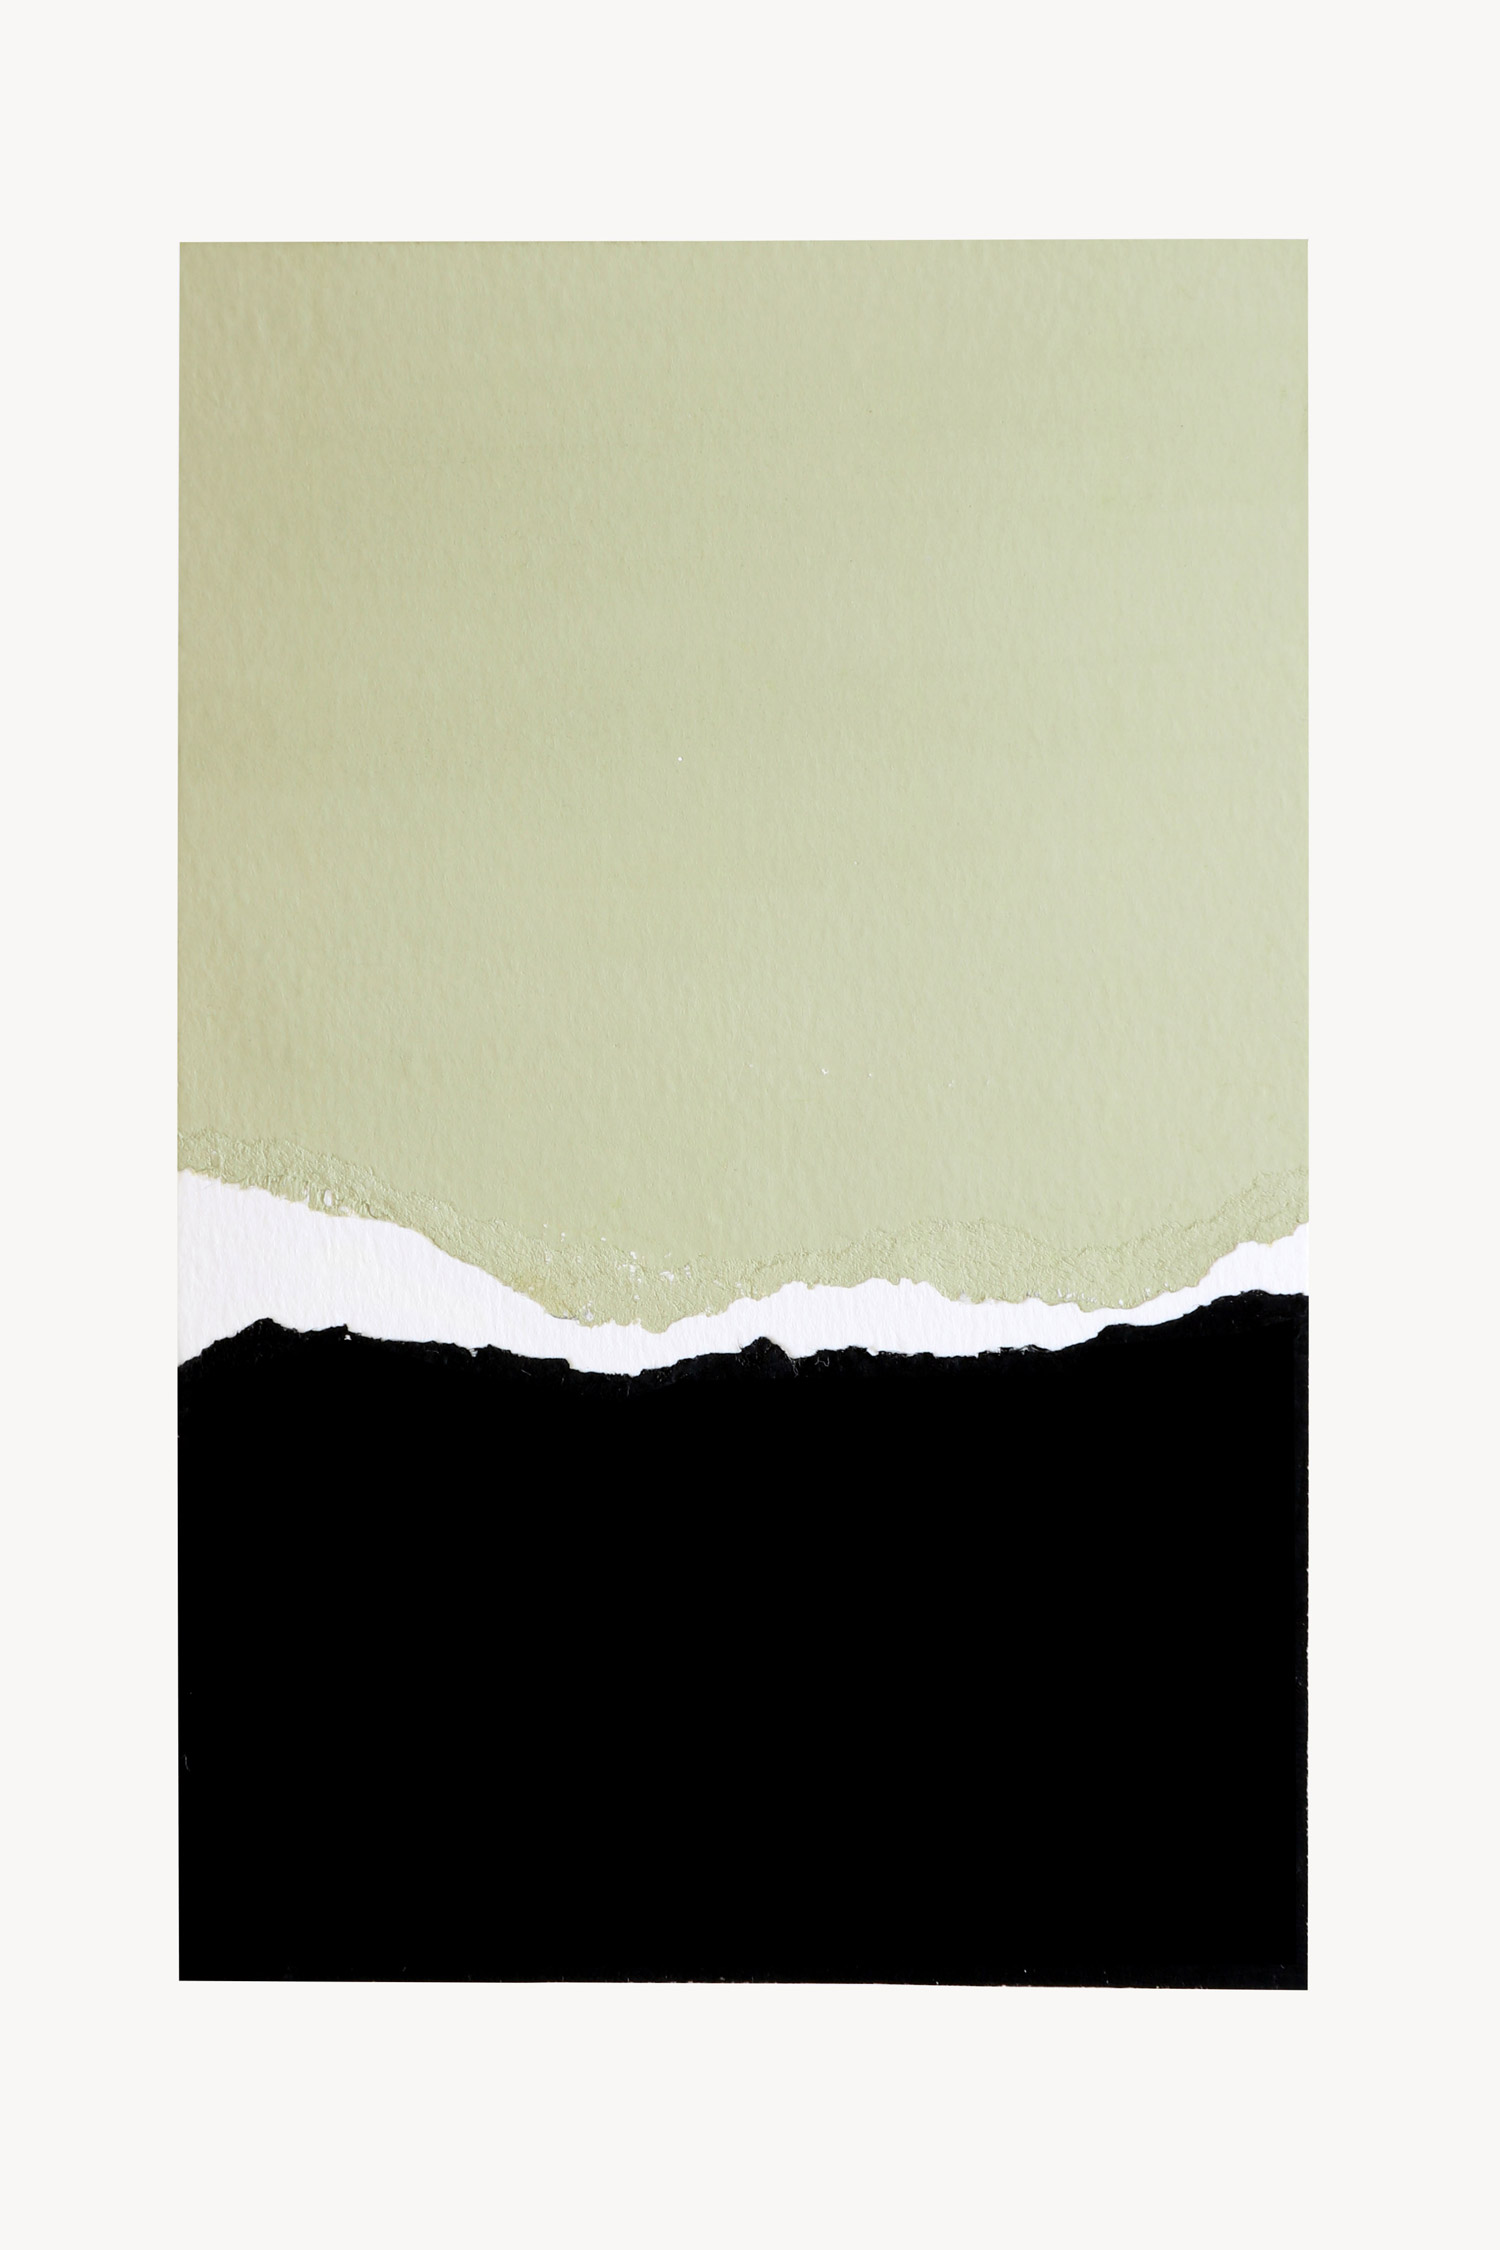 abstract horizon collage, no. 5